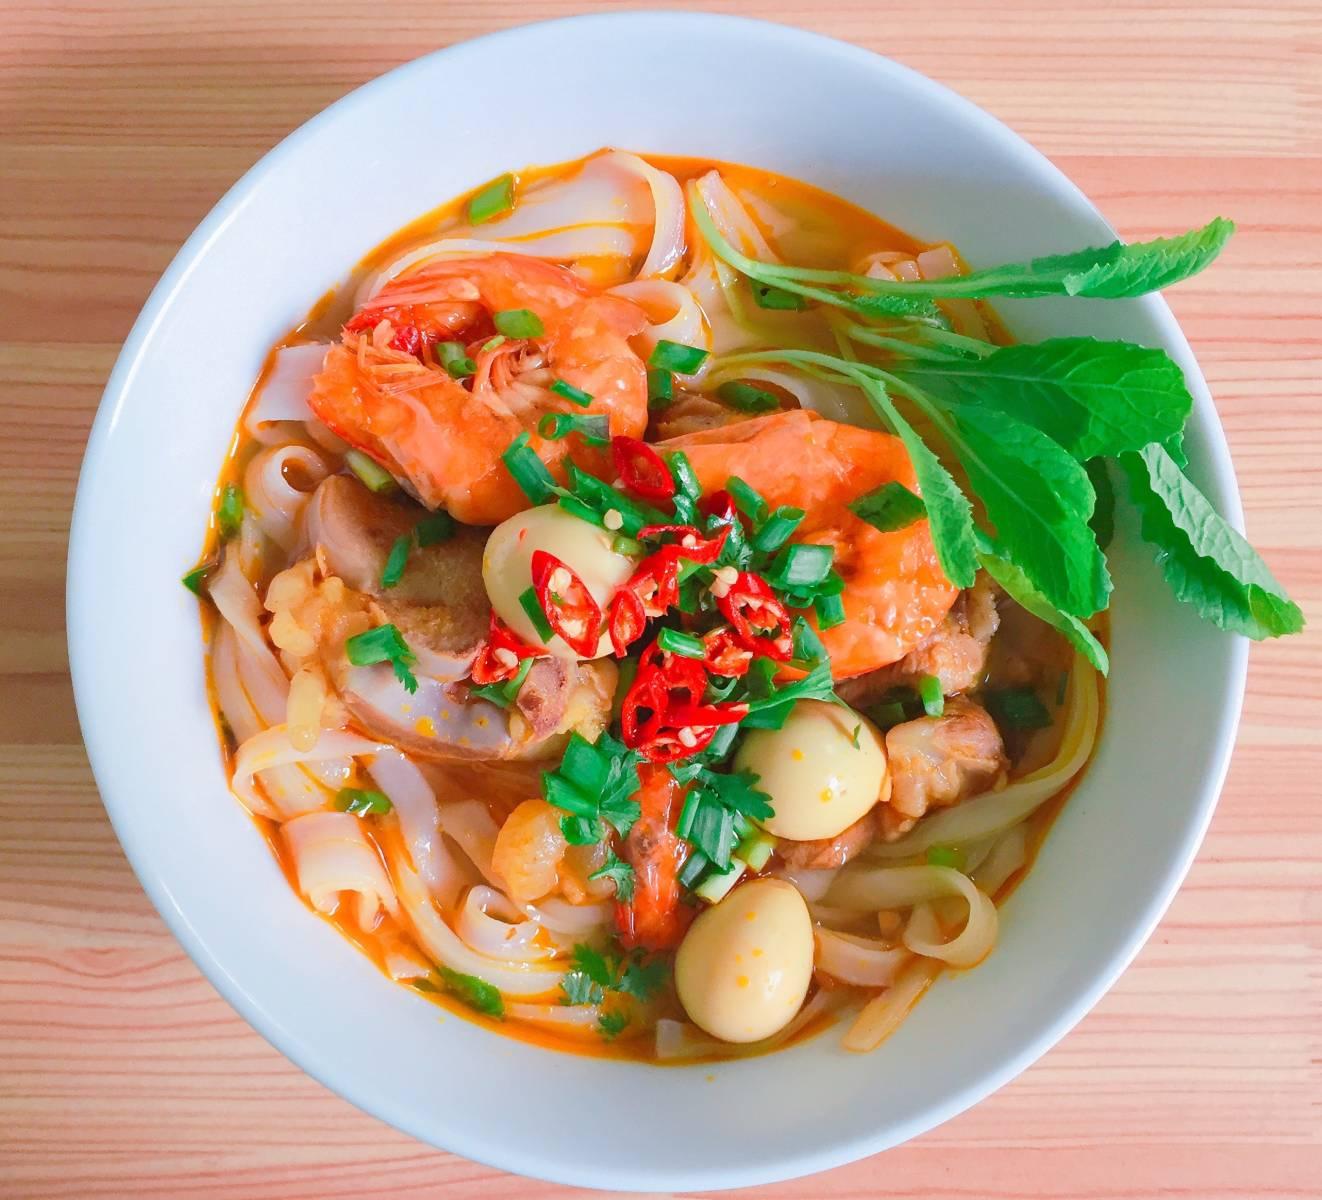 Nudlová polévka s krevetami